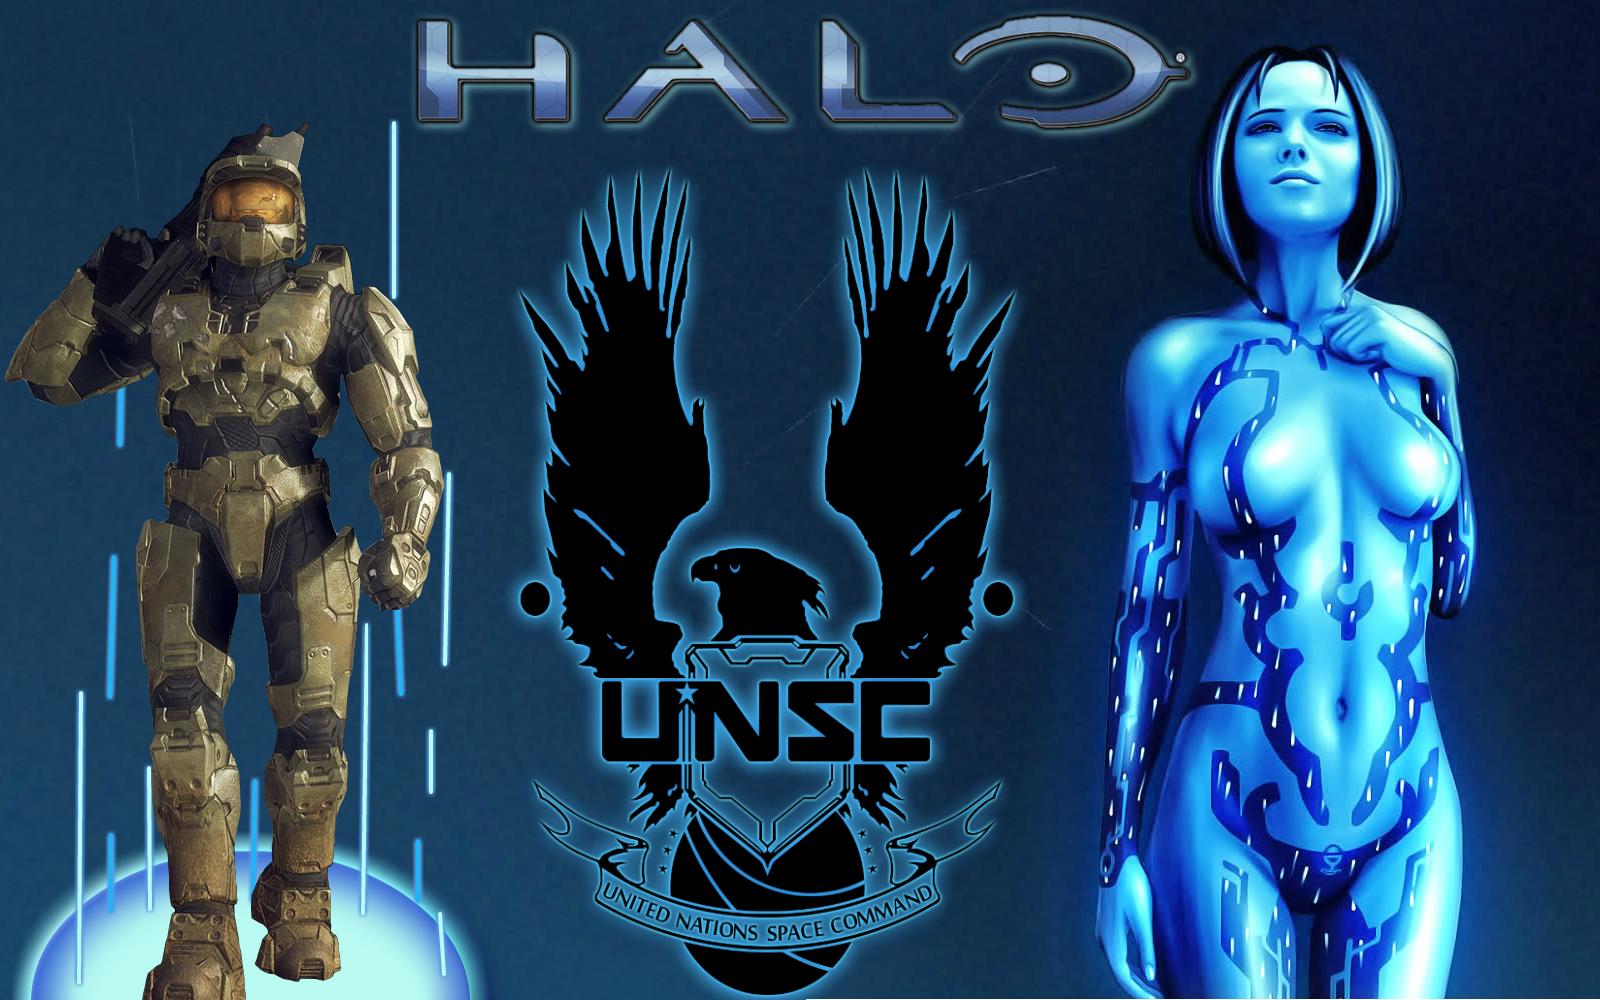 Video Game - Halo  Cortana (Halo) Wallpaper